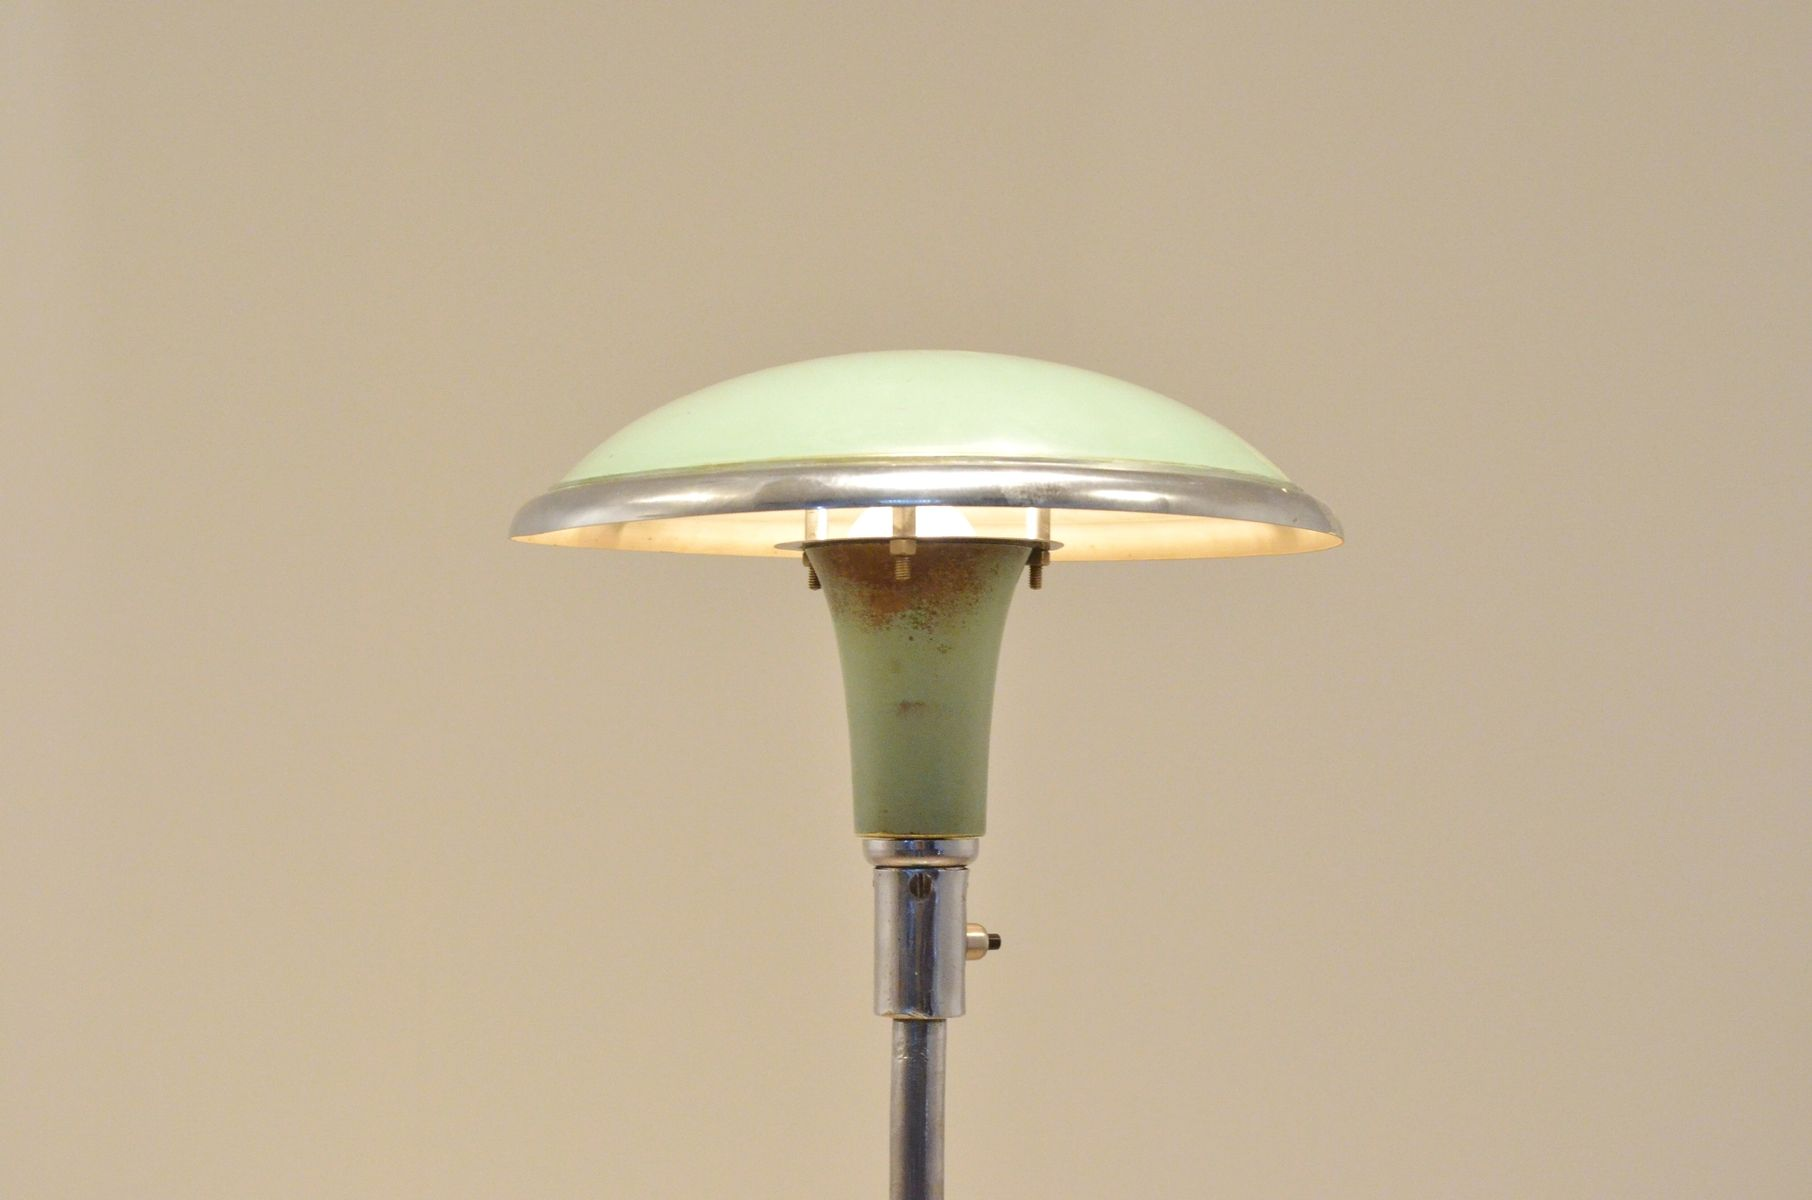 bauhaus pastel green chrome adjustable sellette lamp for sale at pamono. Black Bedroom Furniture Sets. Home Design Ideas